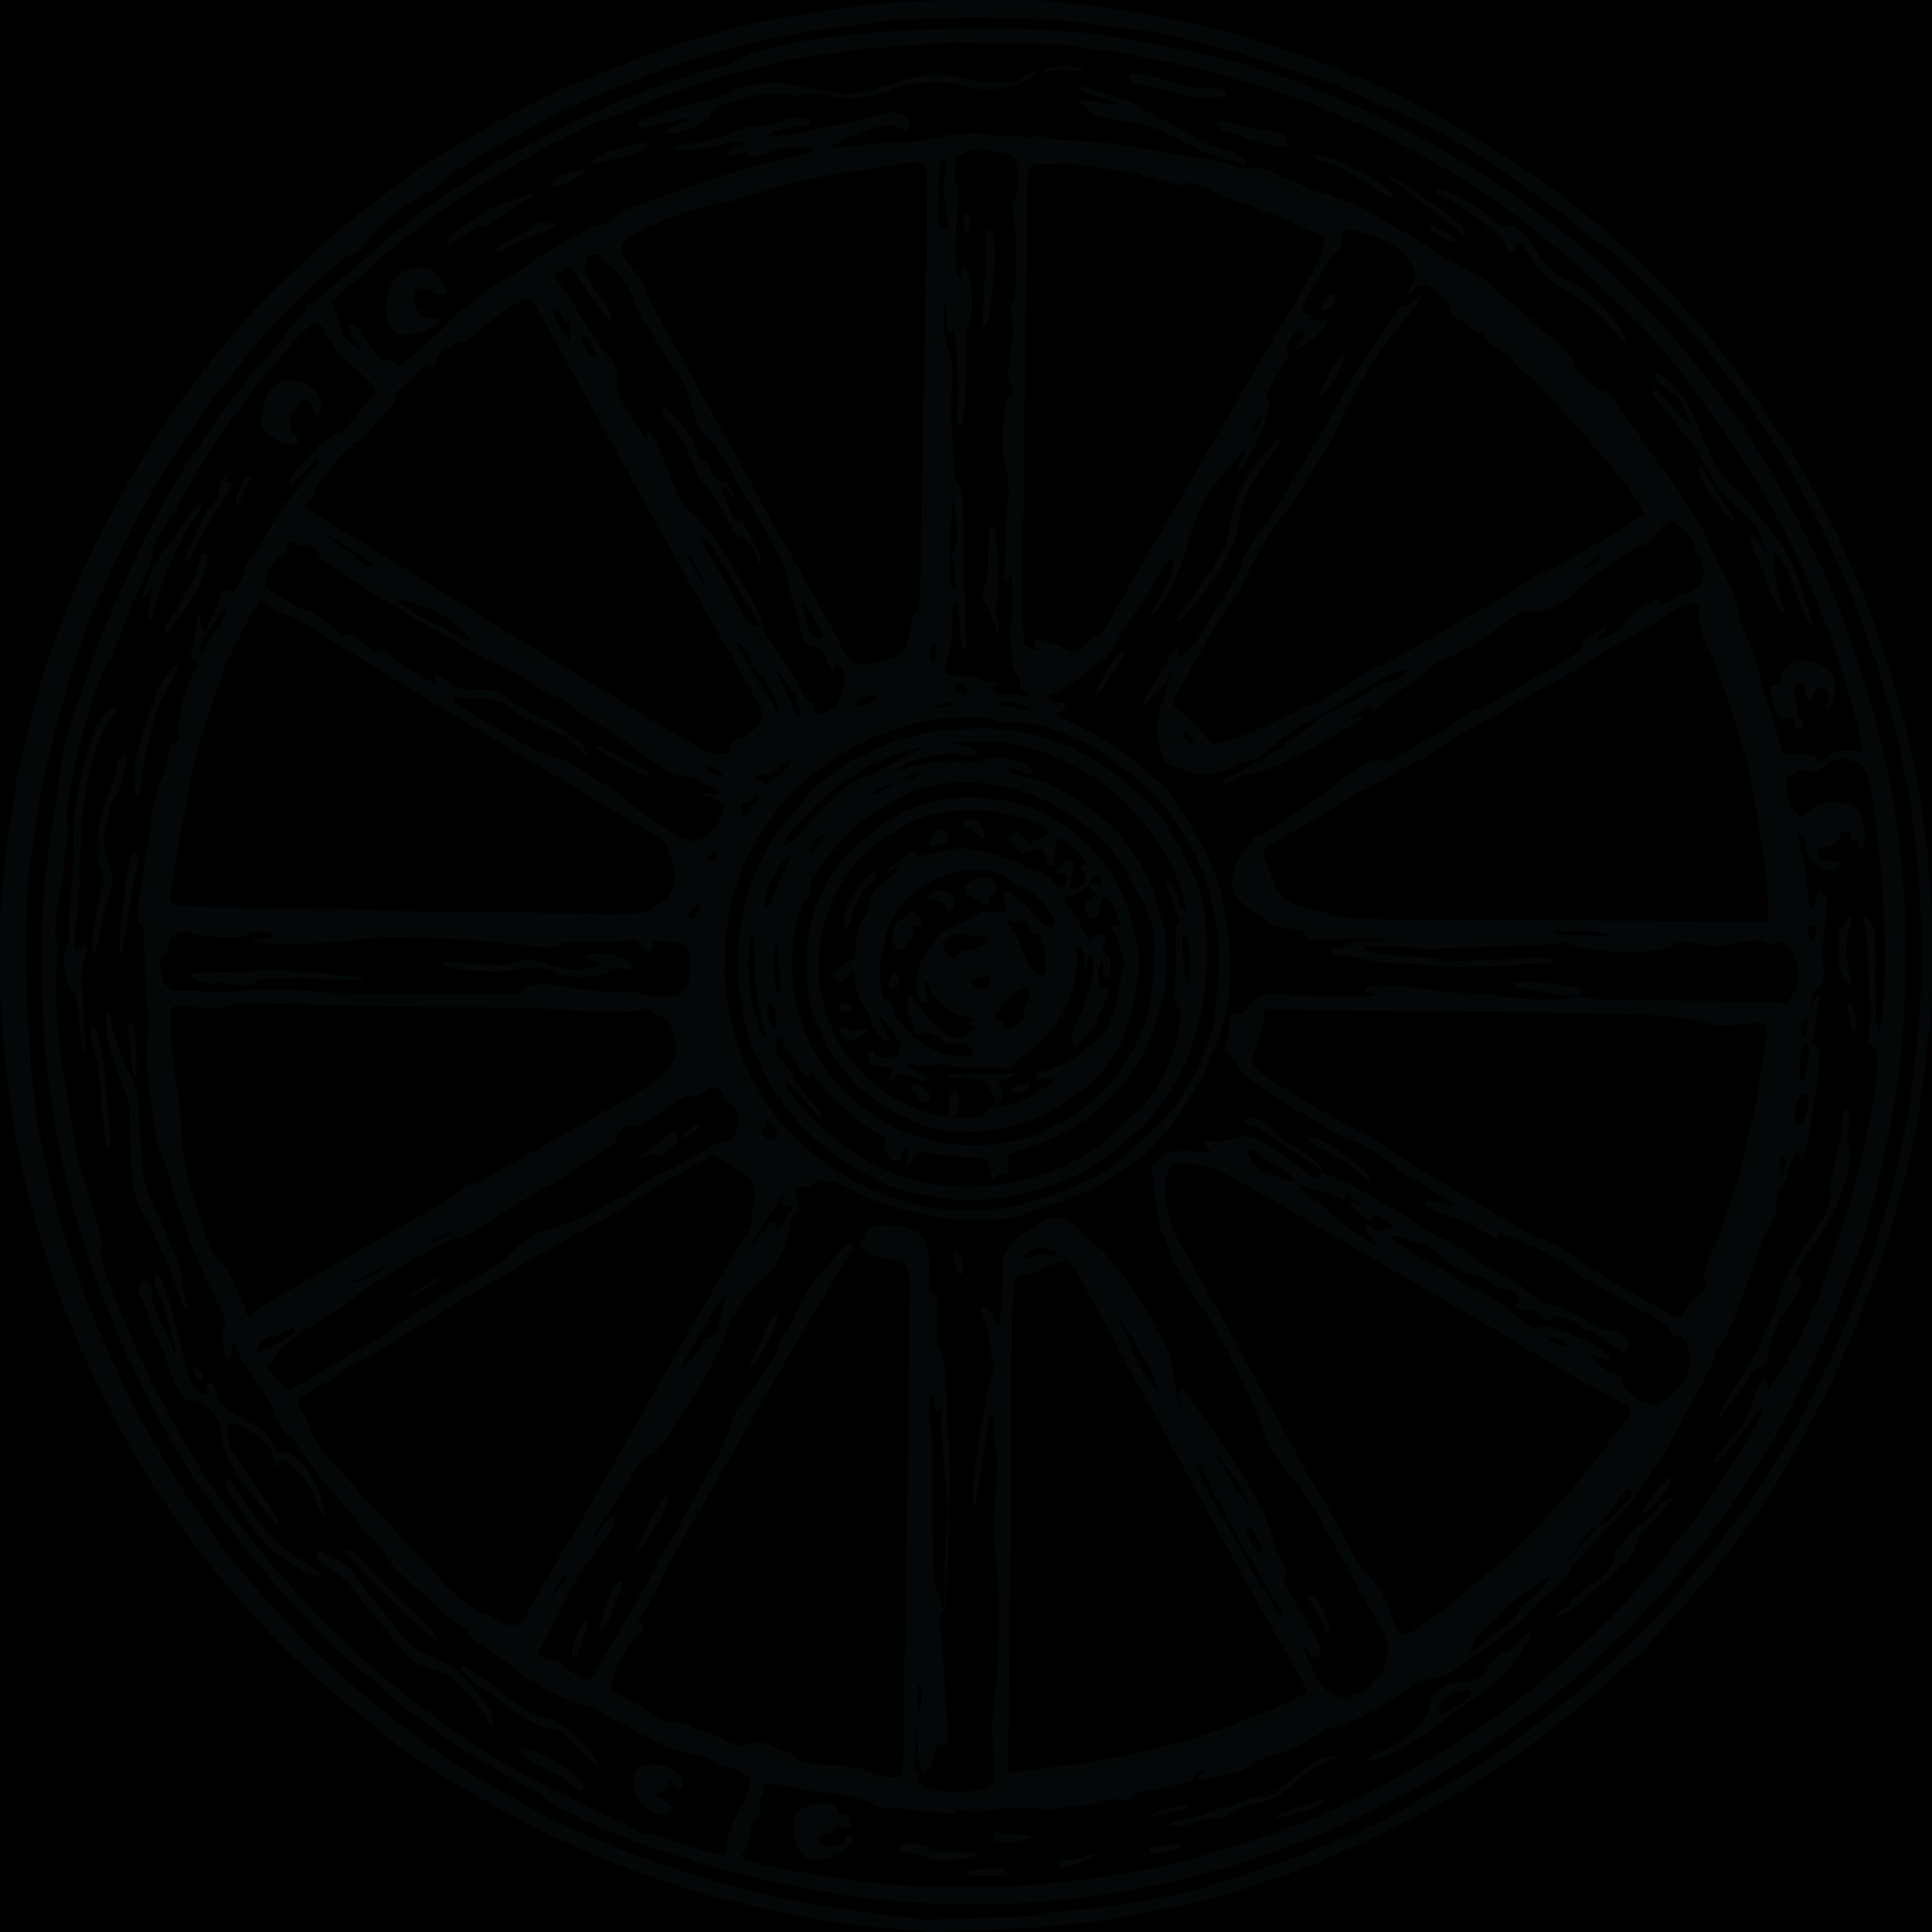 Wheel clipart bullock cart. Rim image group free